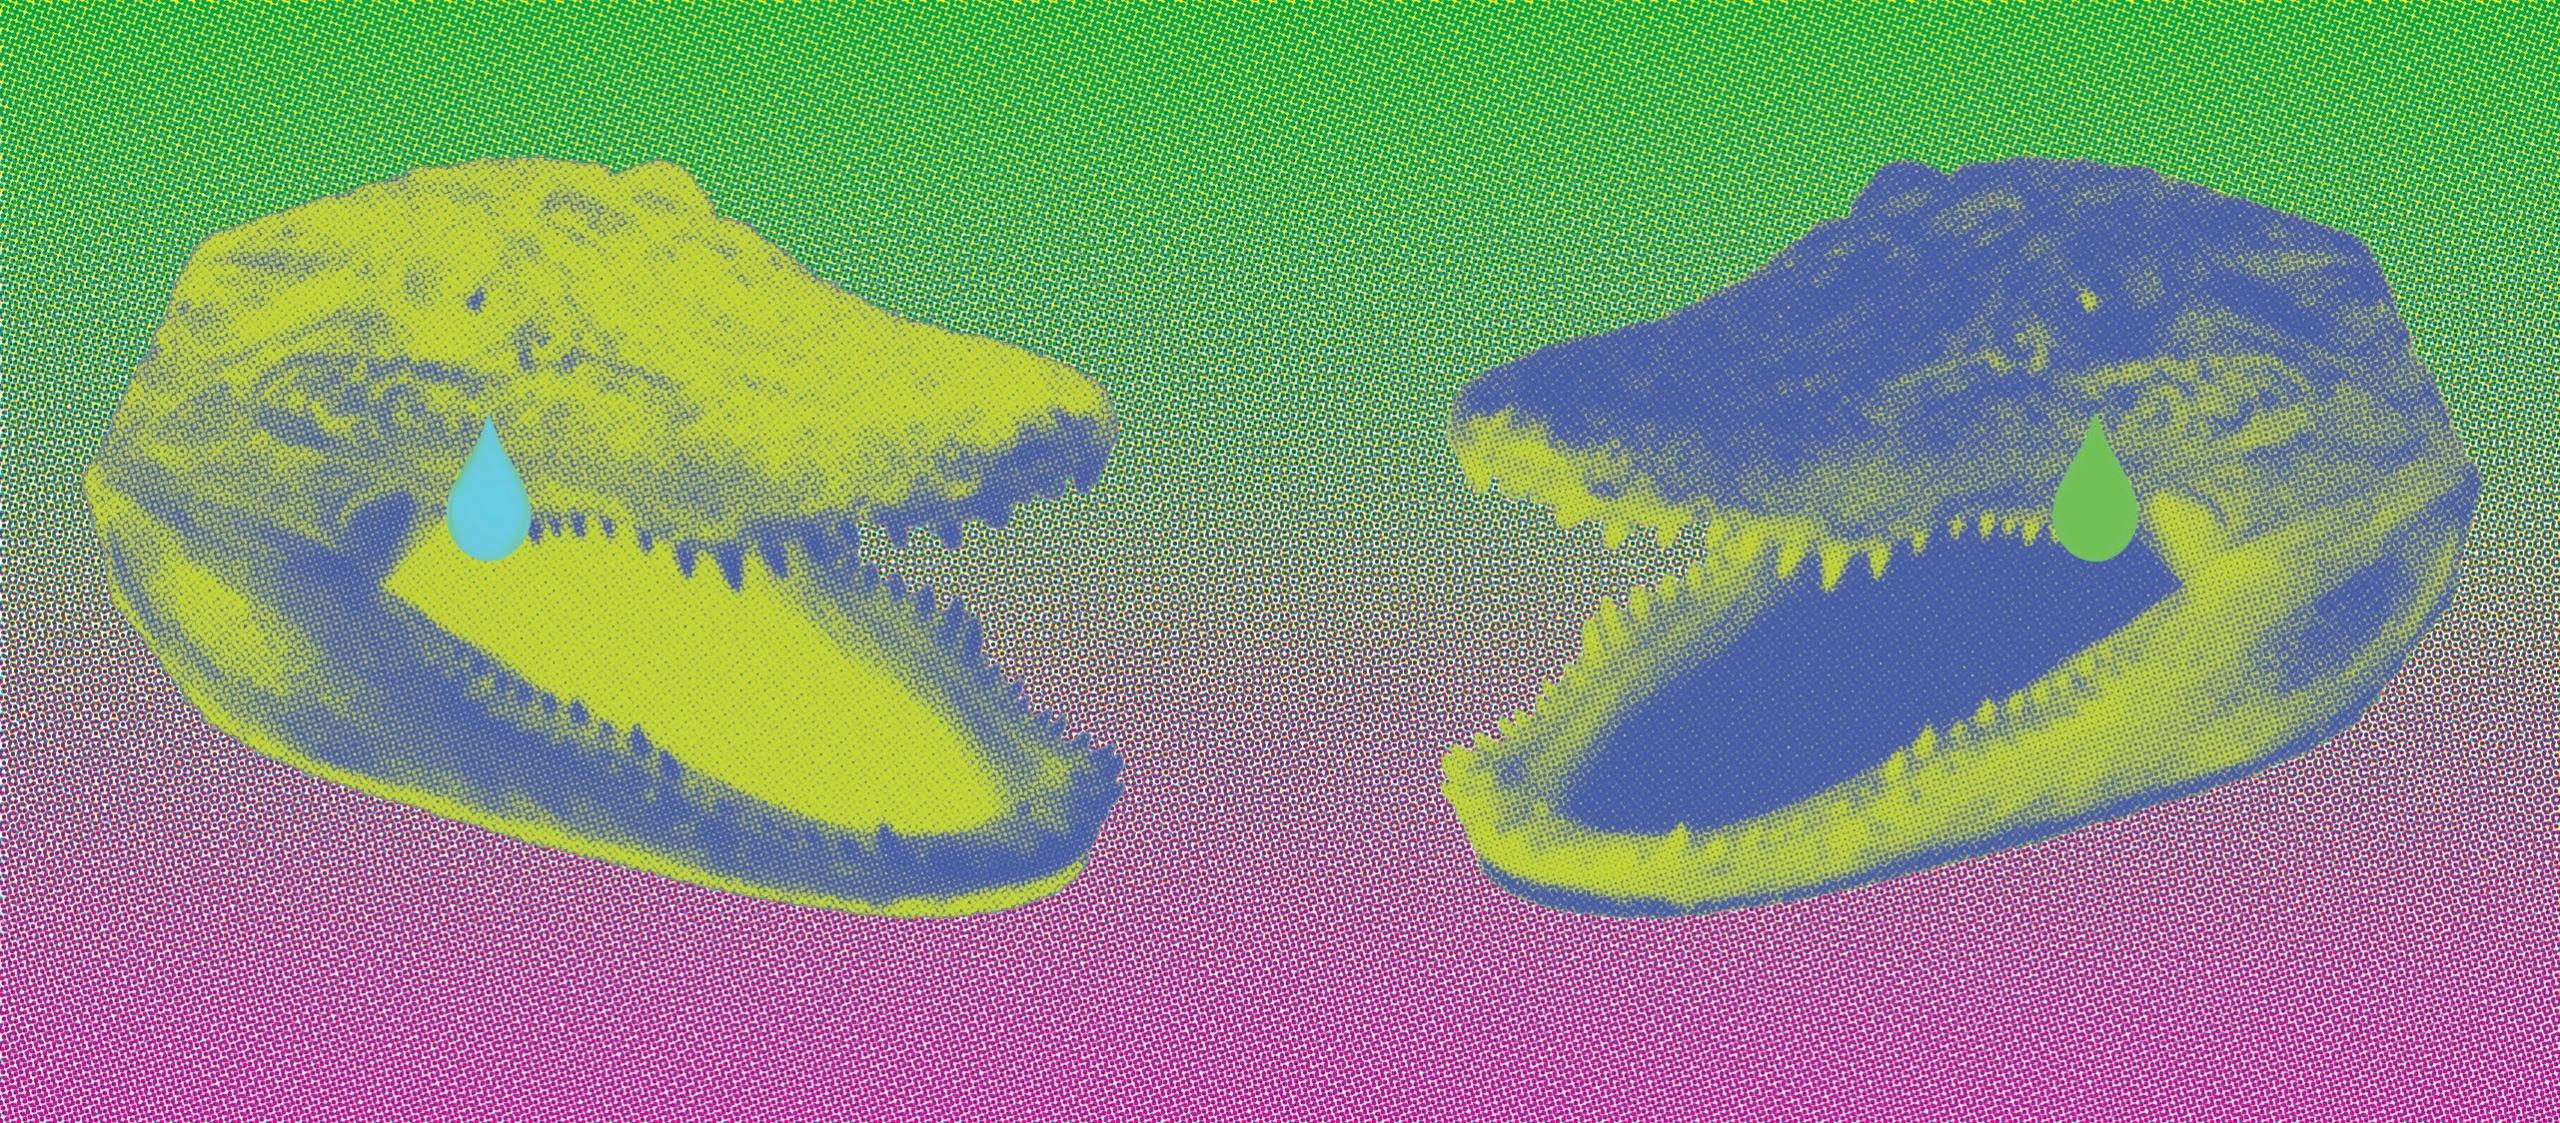 ccrocodile tearss (@ccrocodiletearss) Cover Image